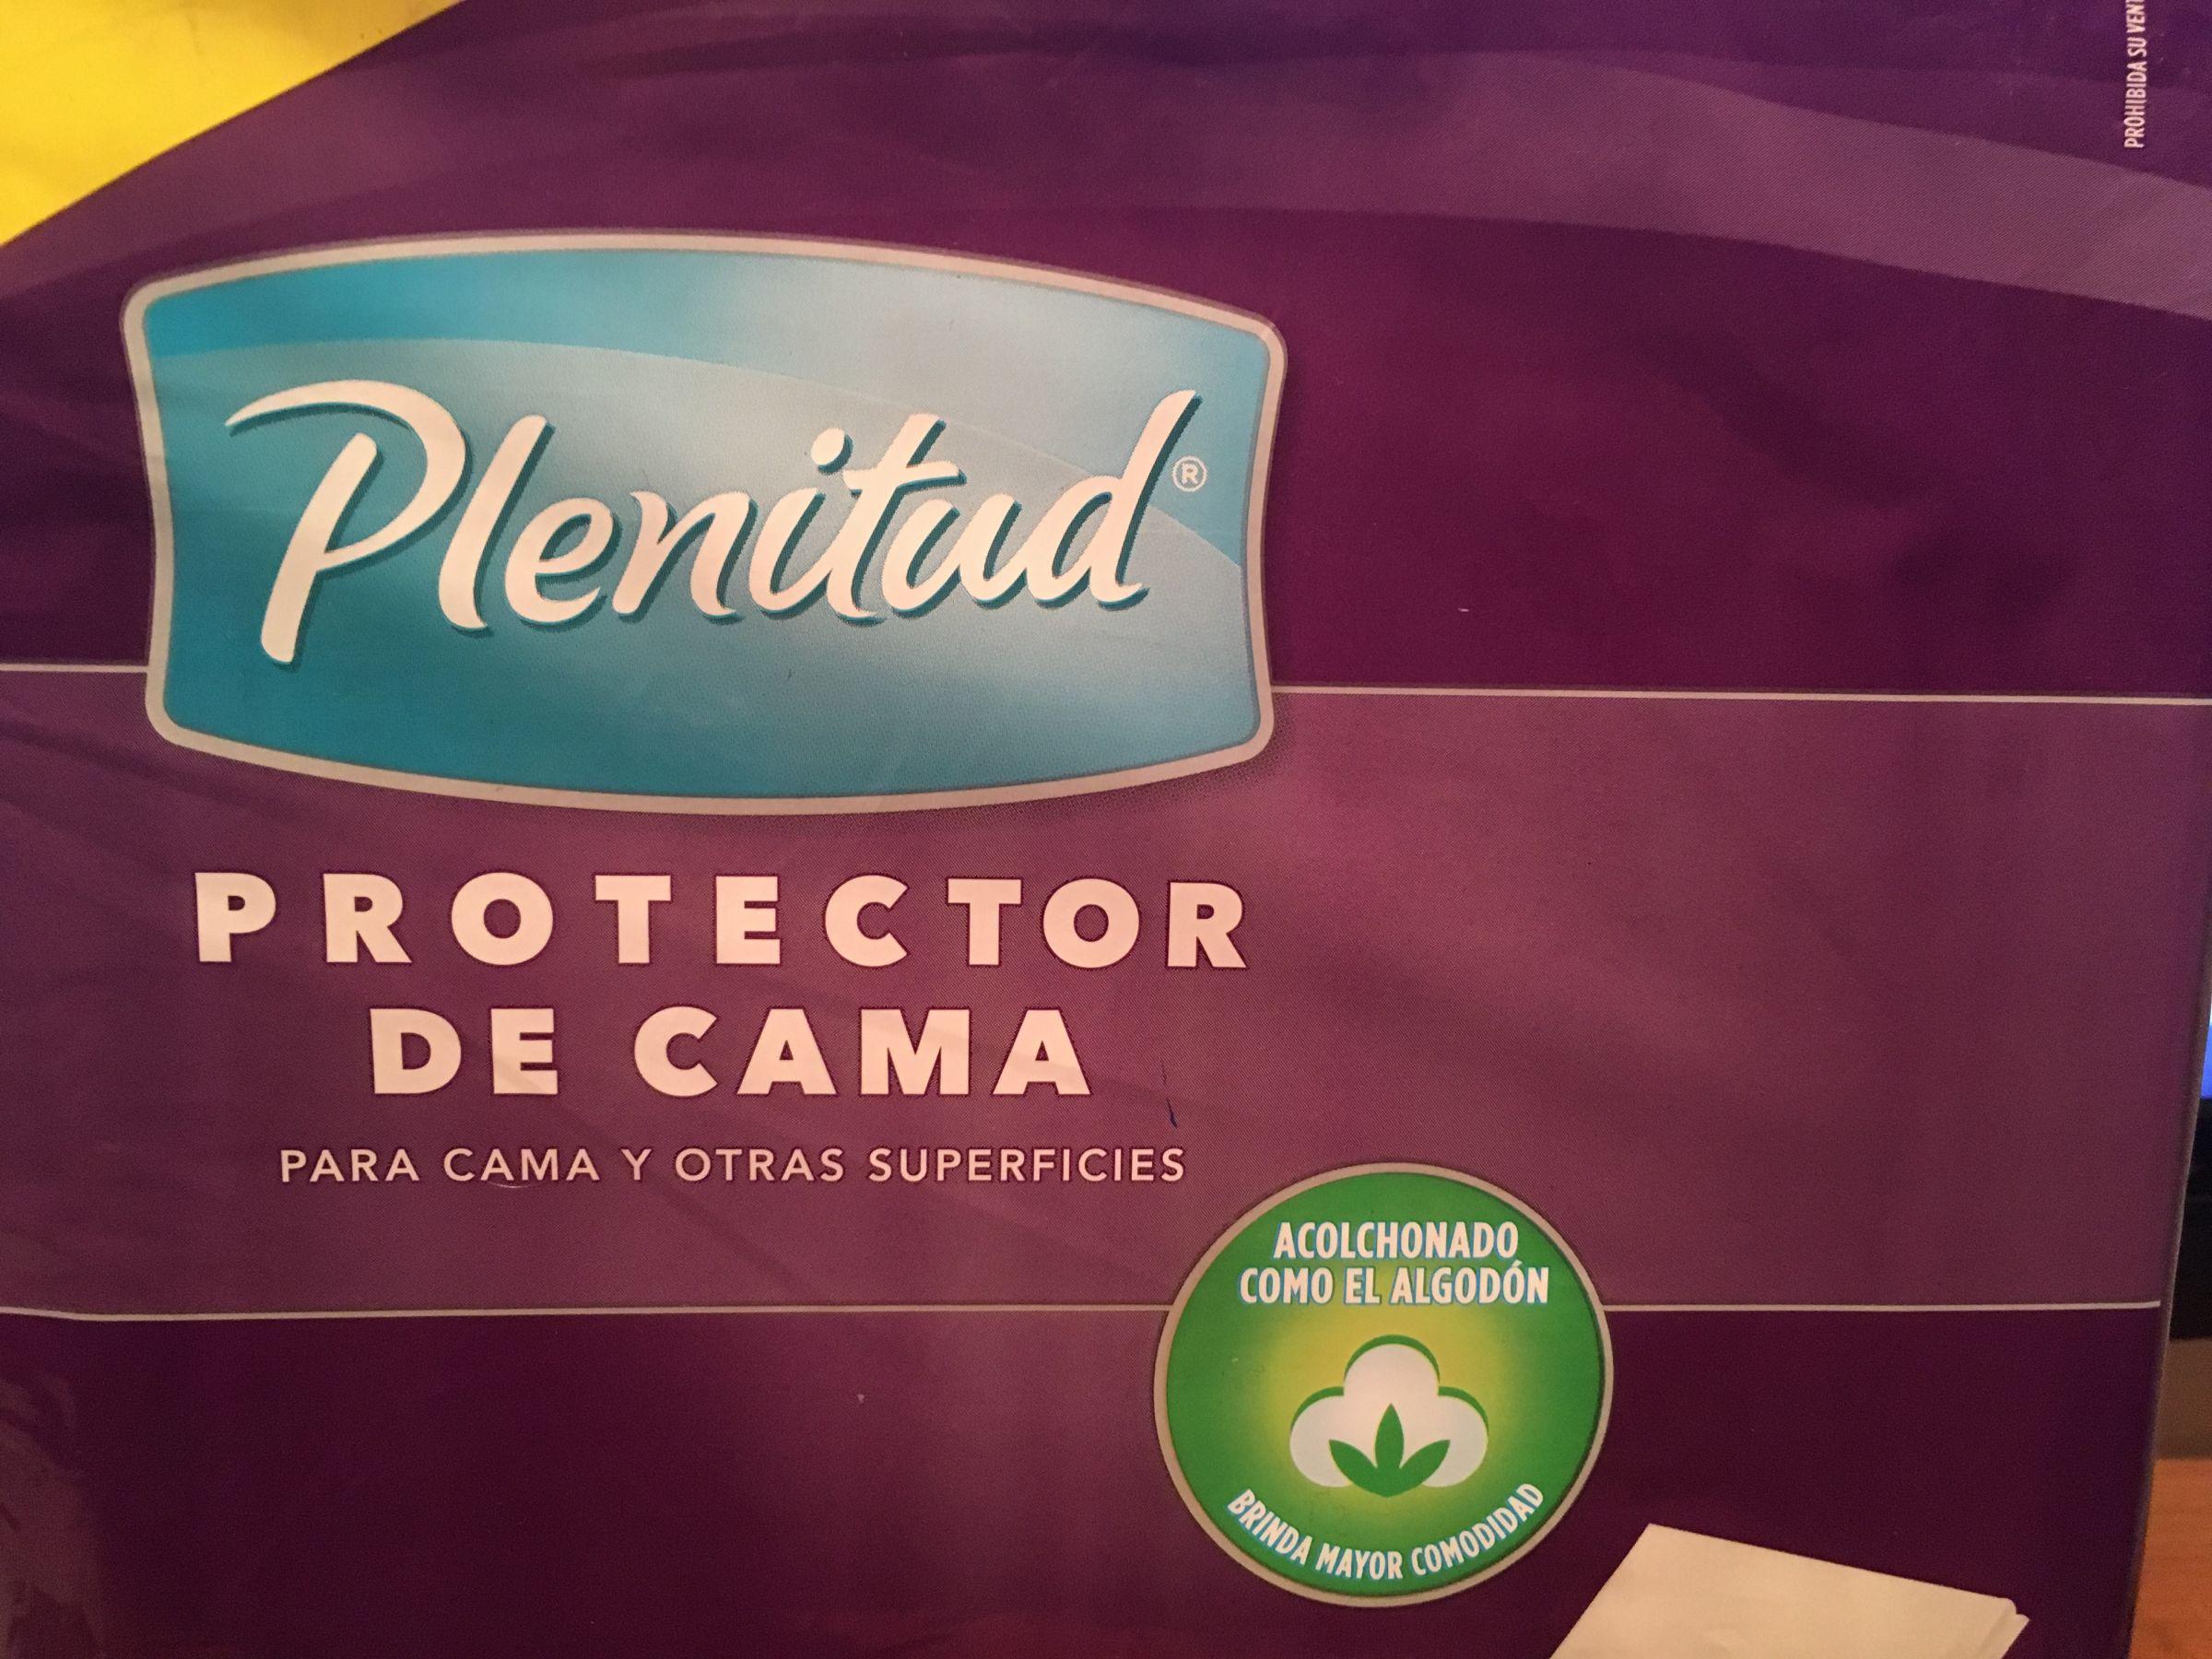 SABANILLAS PLENITUD PROTECTOR CAMA